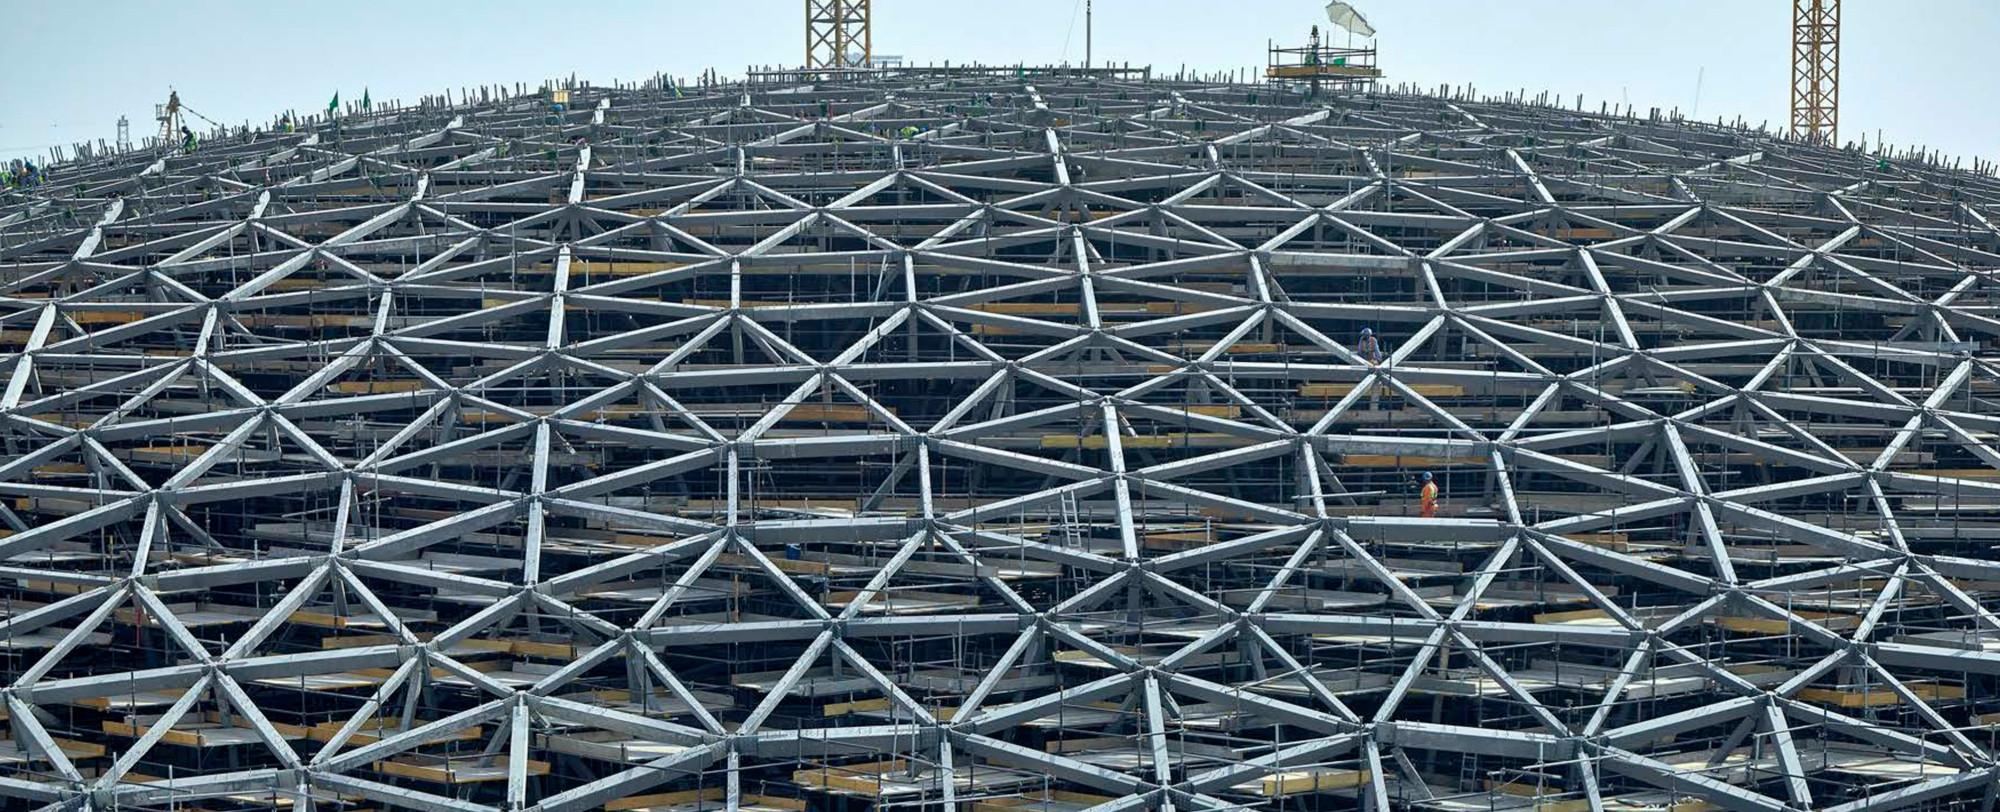 The Engineering Behind the Louvre Abu Dhabi's Striking